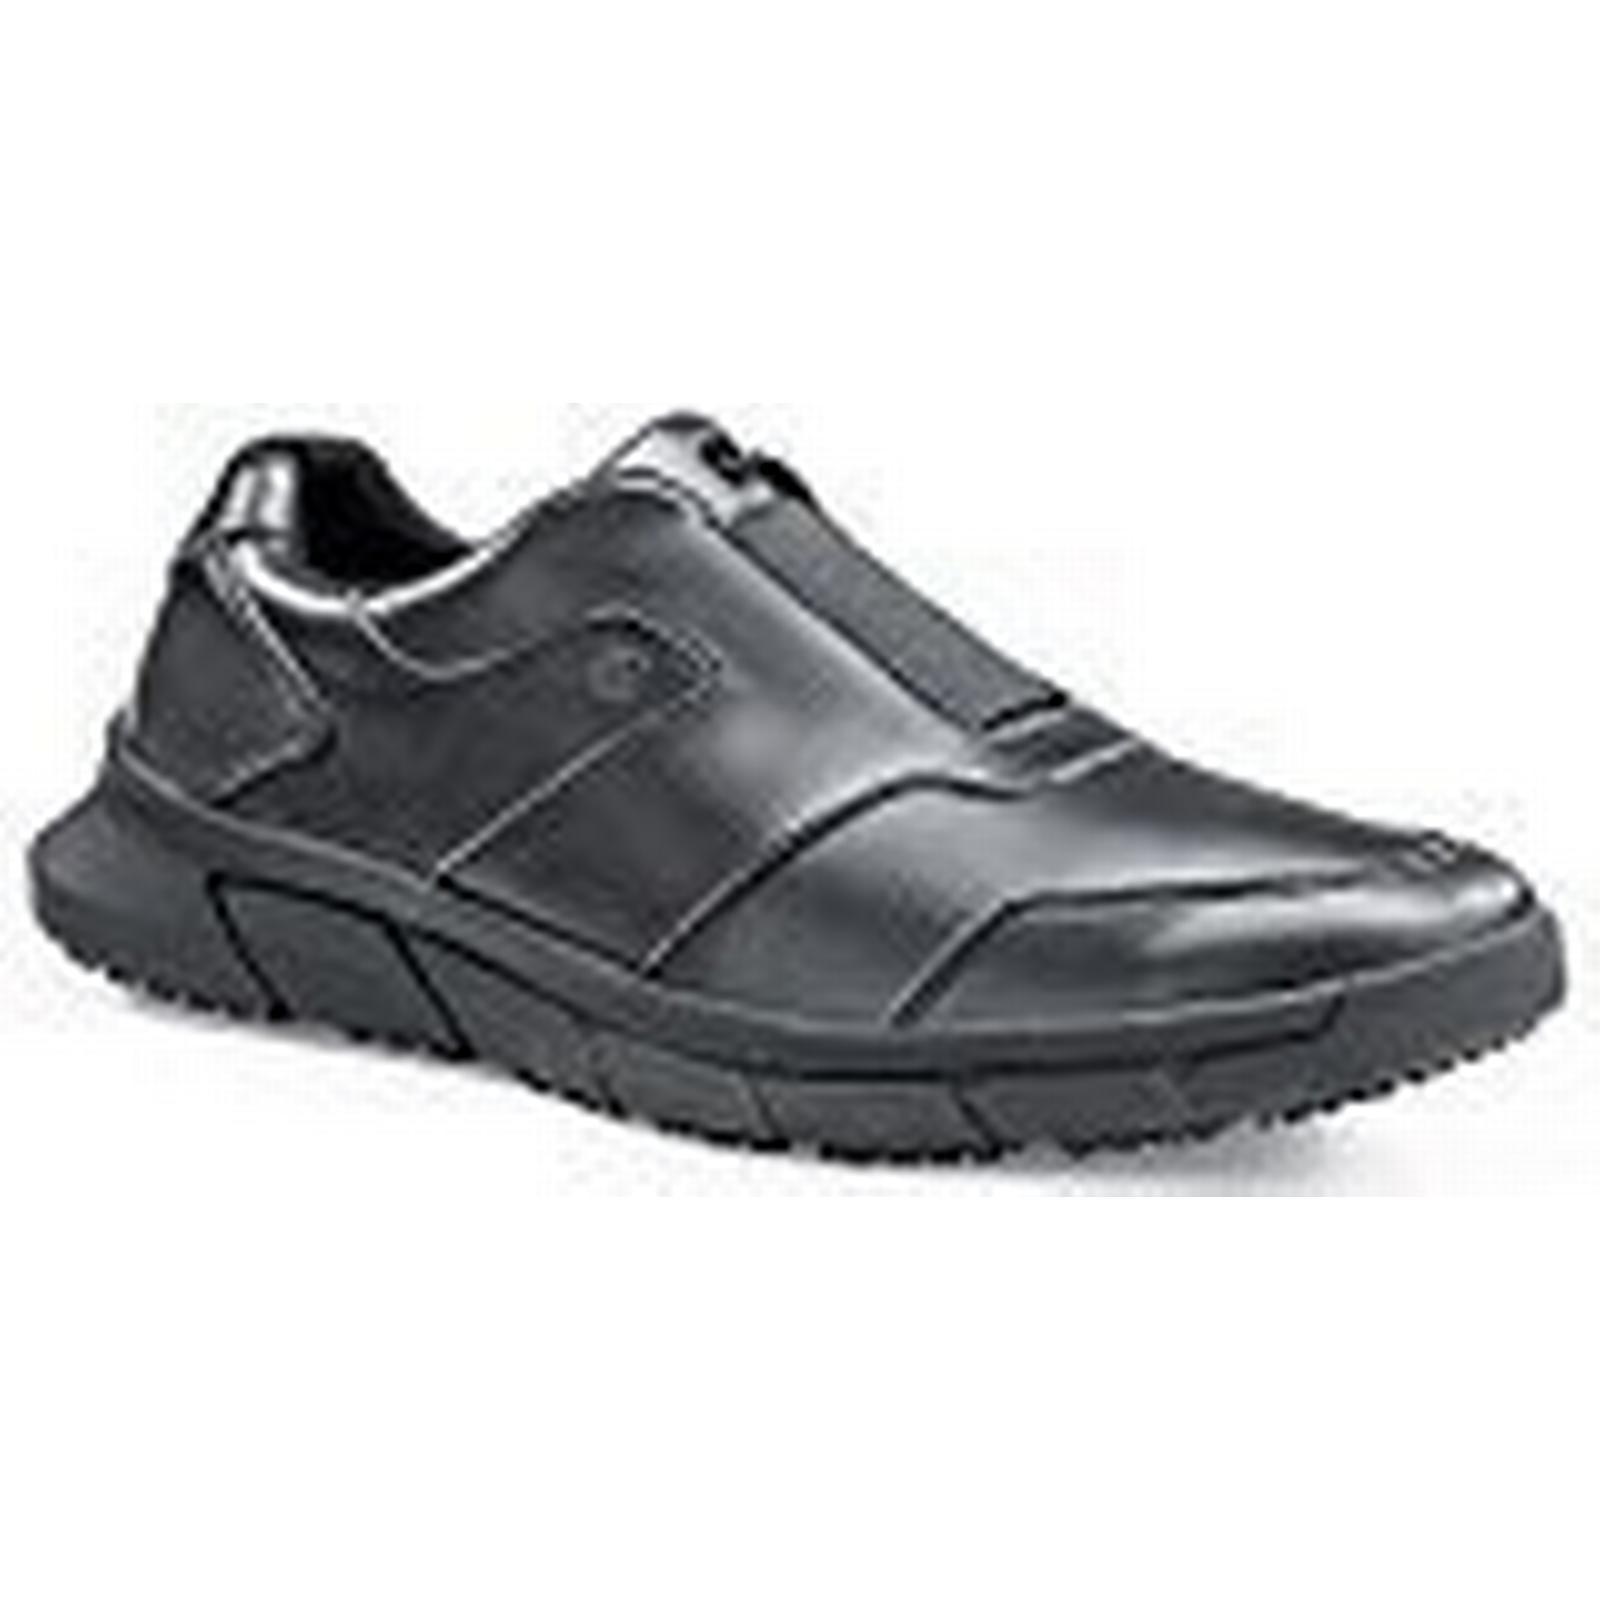 Shoes for Crews 36479-43/9 Style Grayson Men's Slip Black Resistant Shoes, Size 9, Black Slip - EN safety certified 9f5849